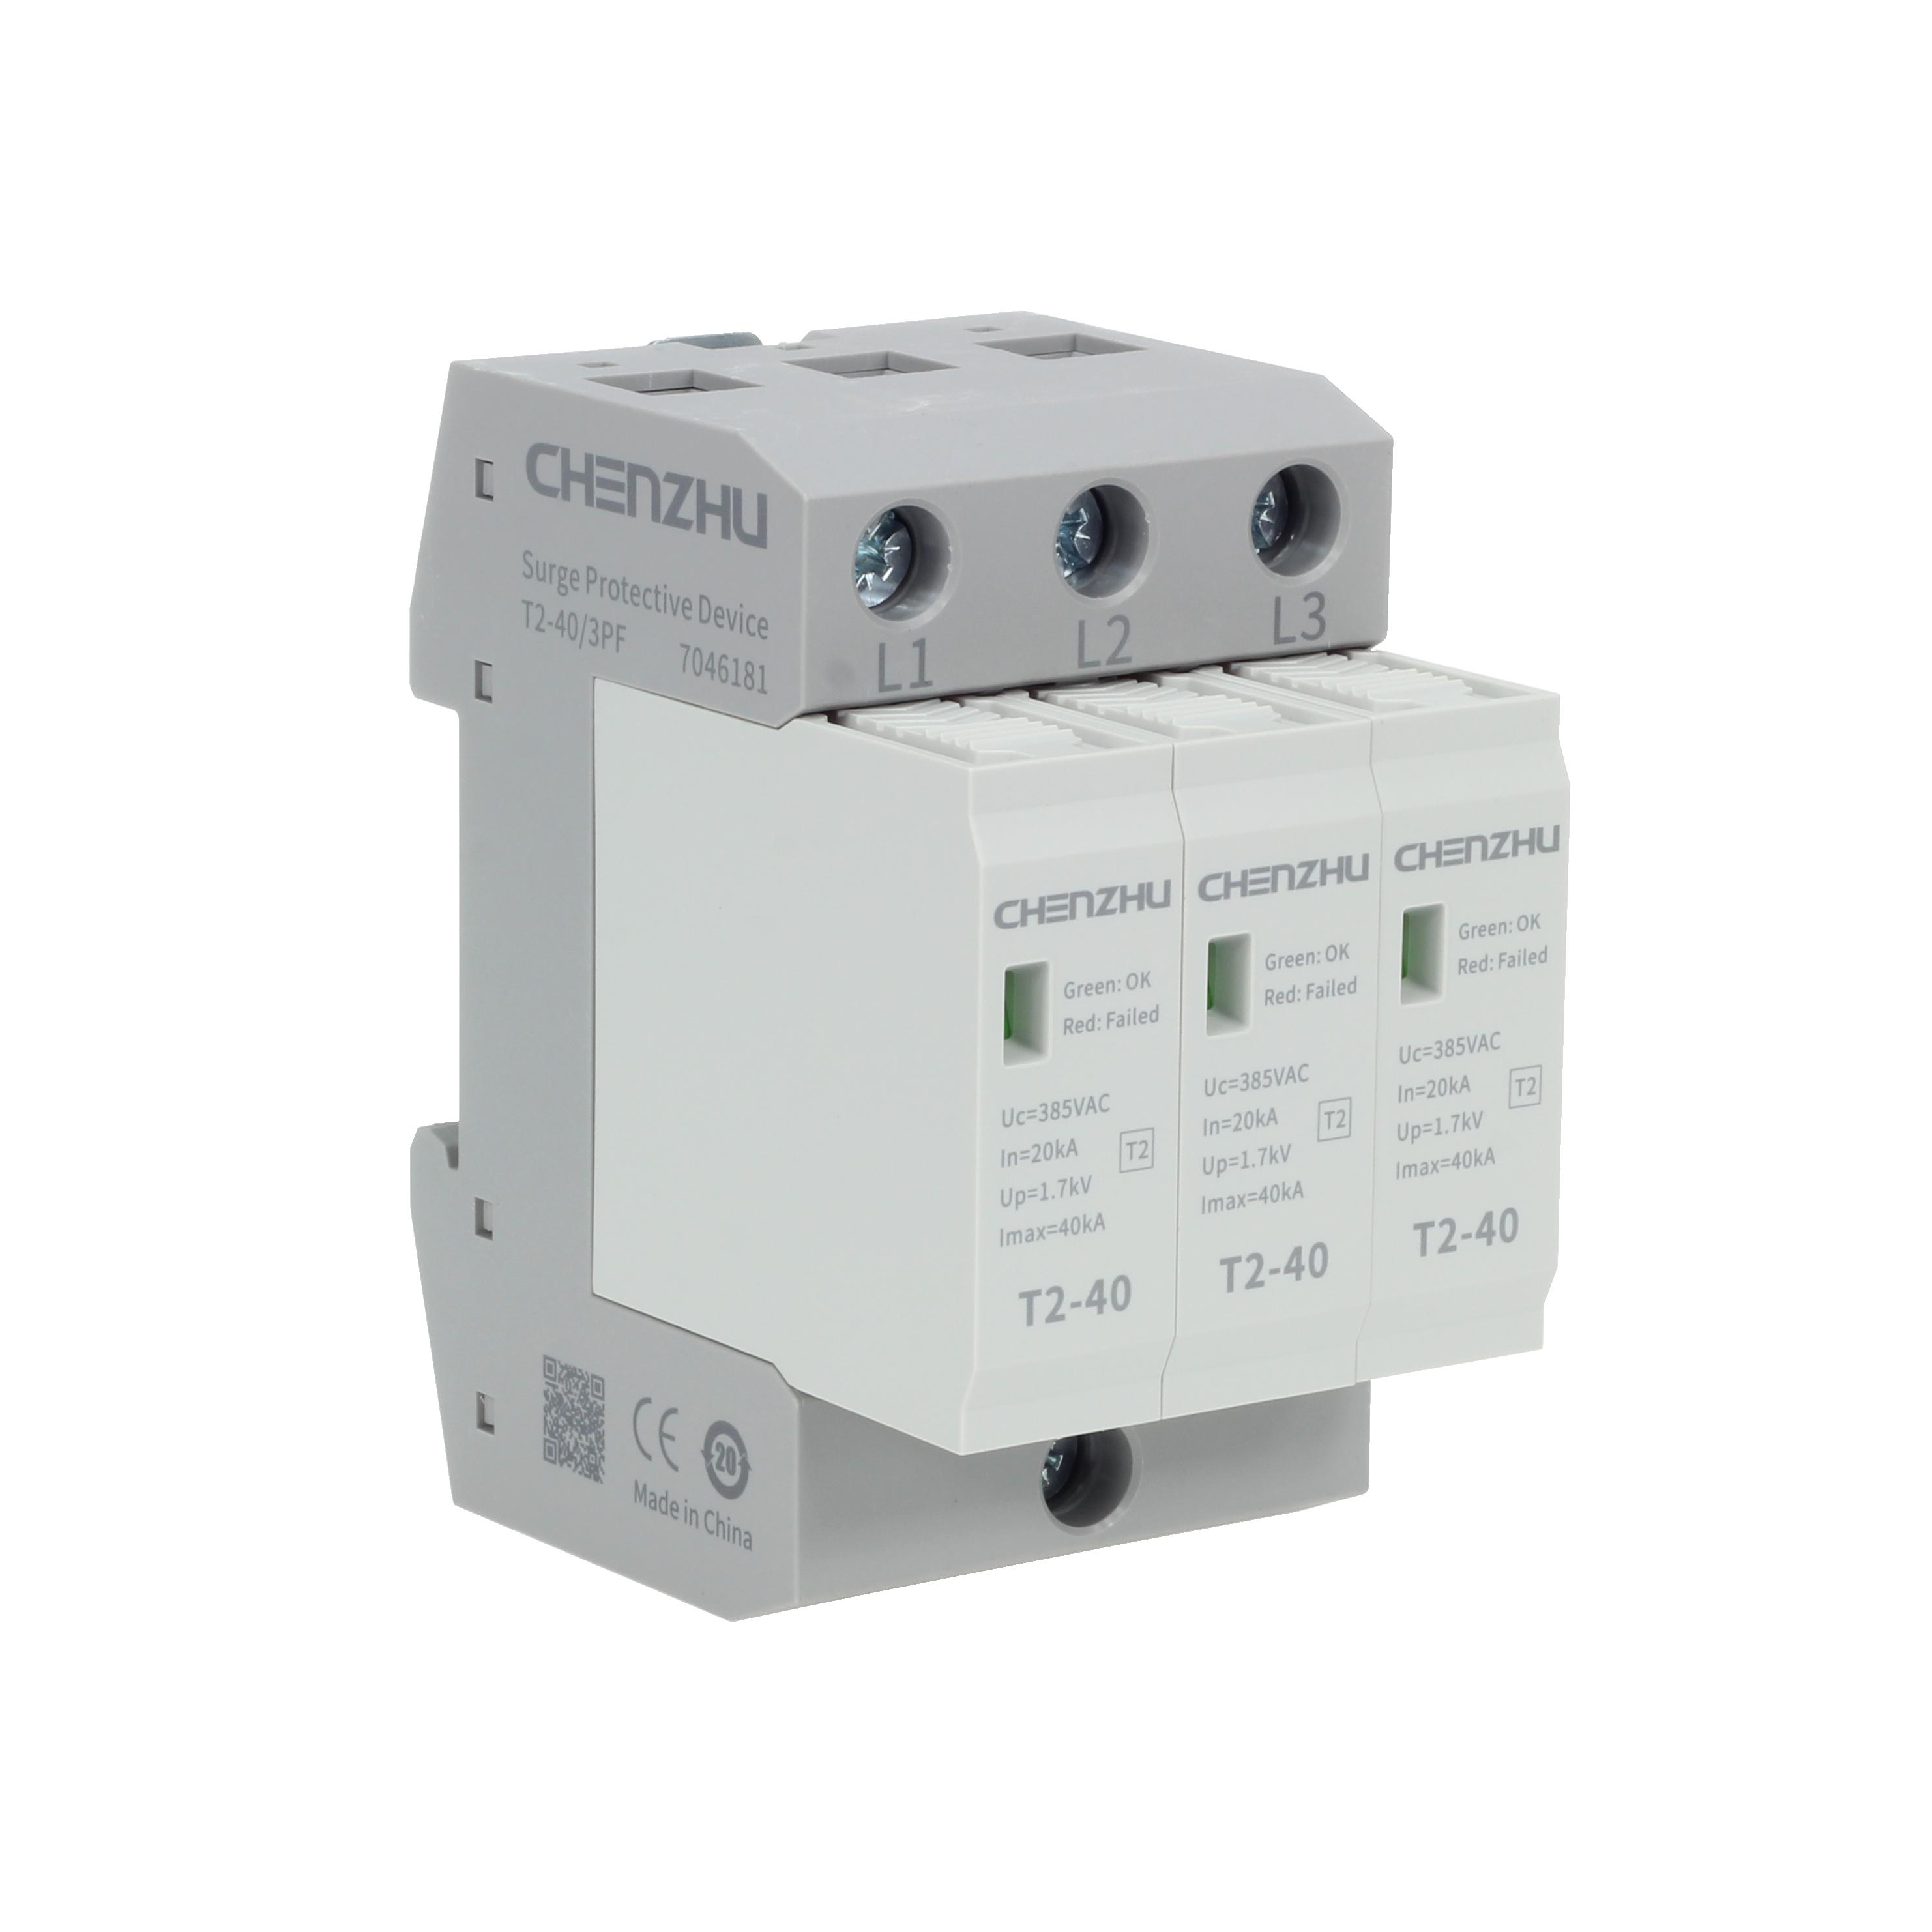 AC Power SPD (220/380VAC; IT or TN-C system, Three phase; In=20kA; alarm output ) 7043461